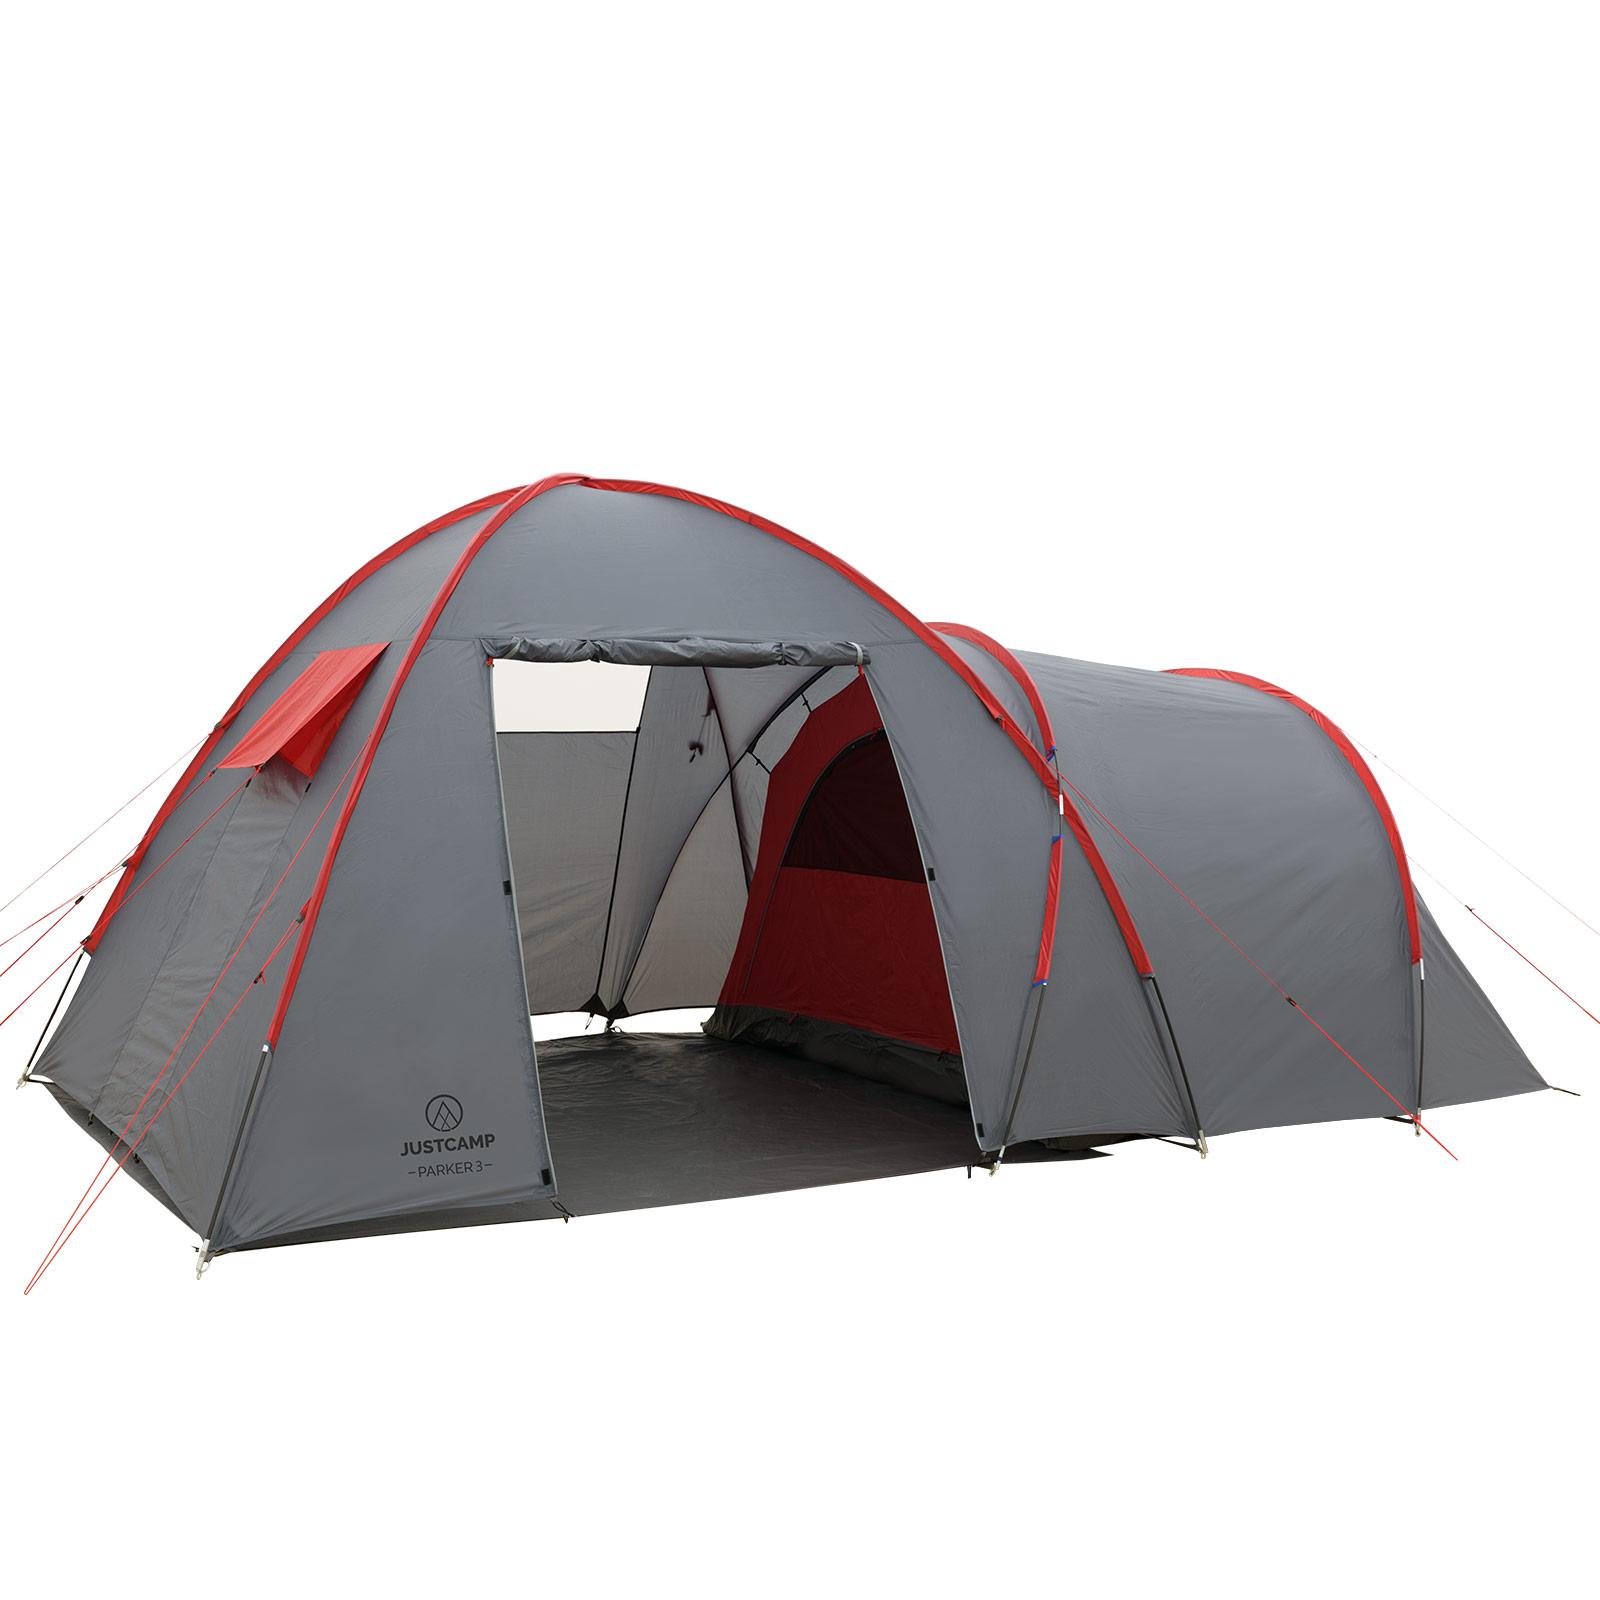 Zelt 5 Personen Stehhöhe : Zelt mit stehhöhe justcamp parker familienzelt